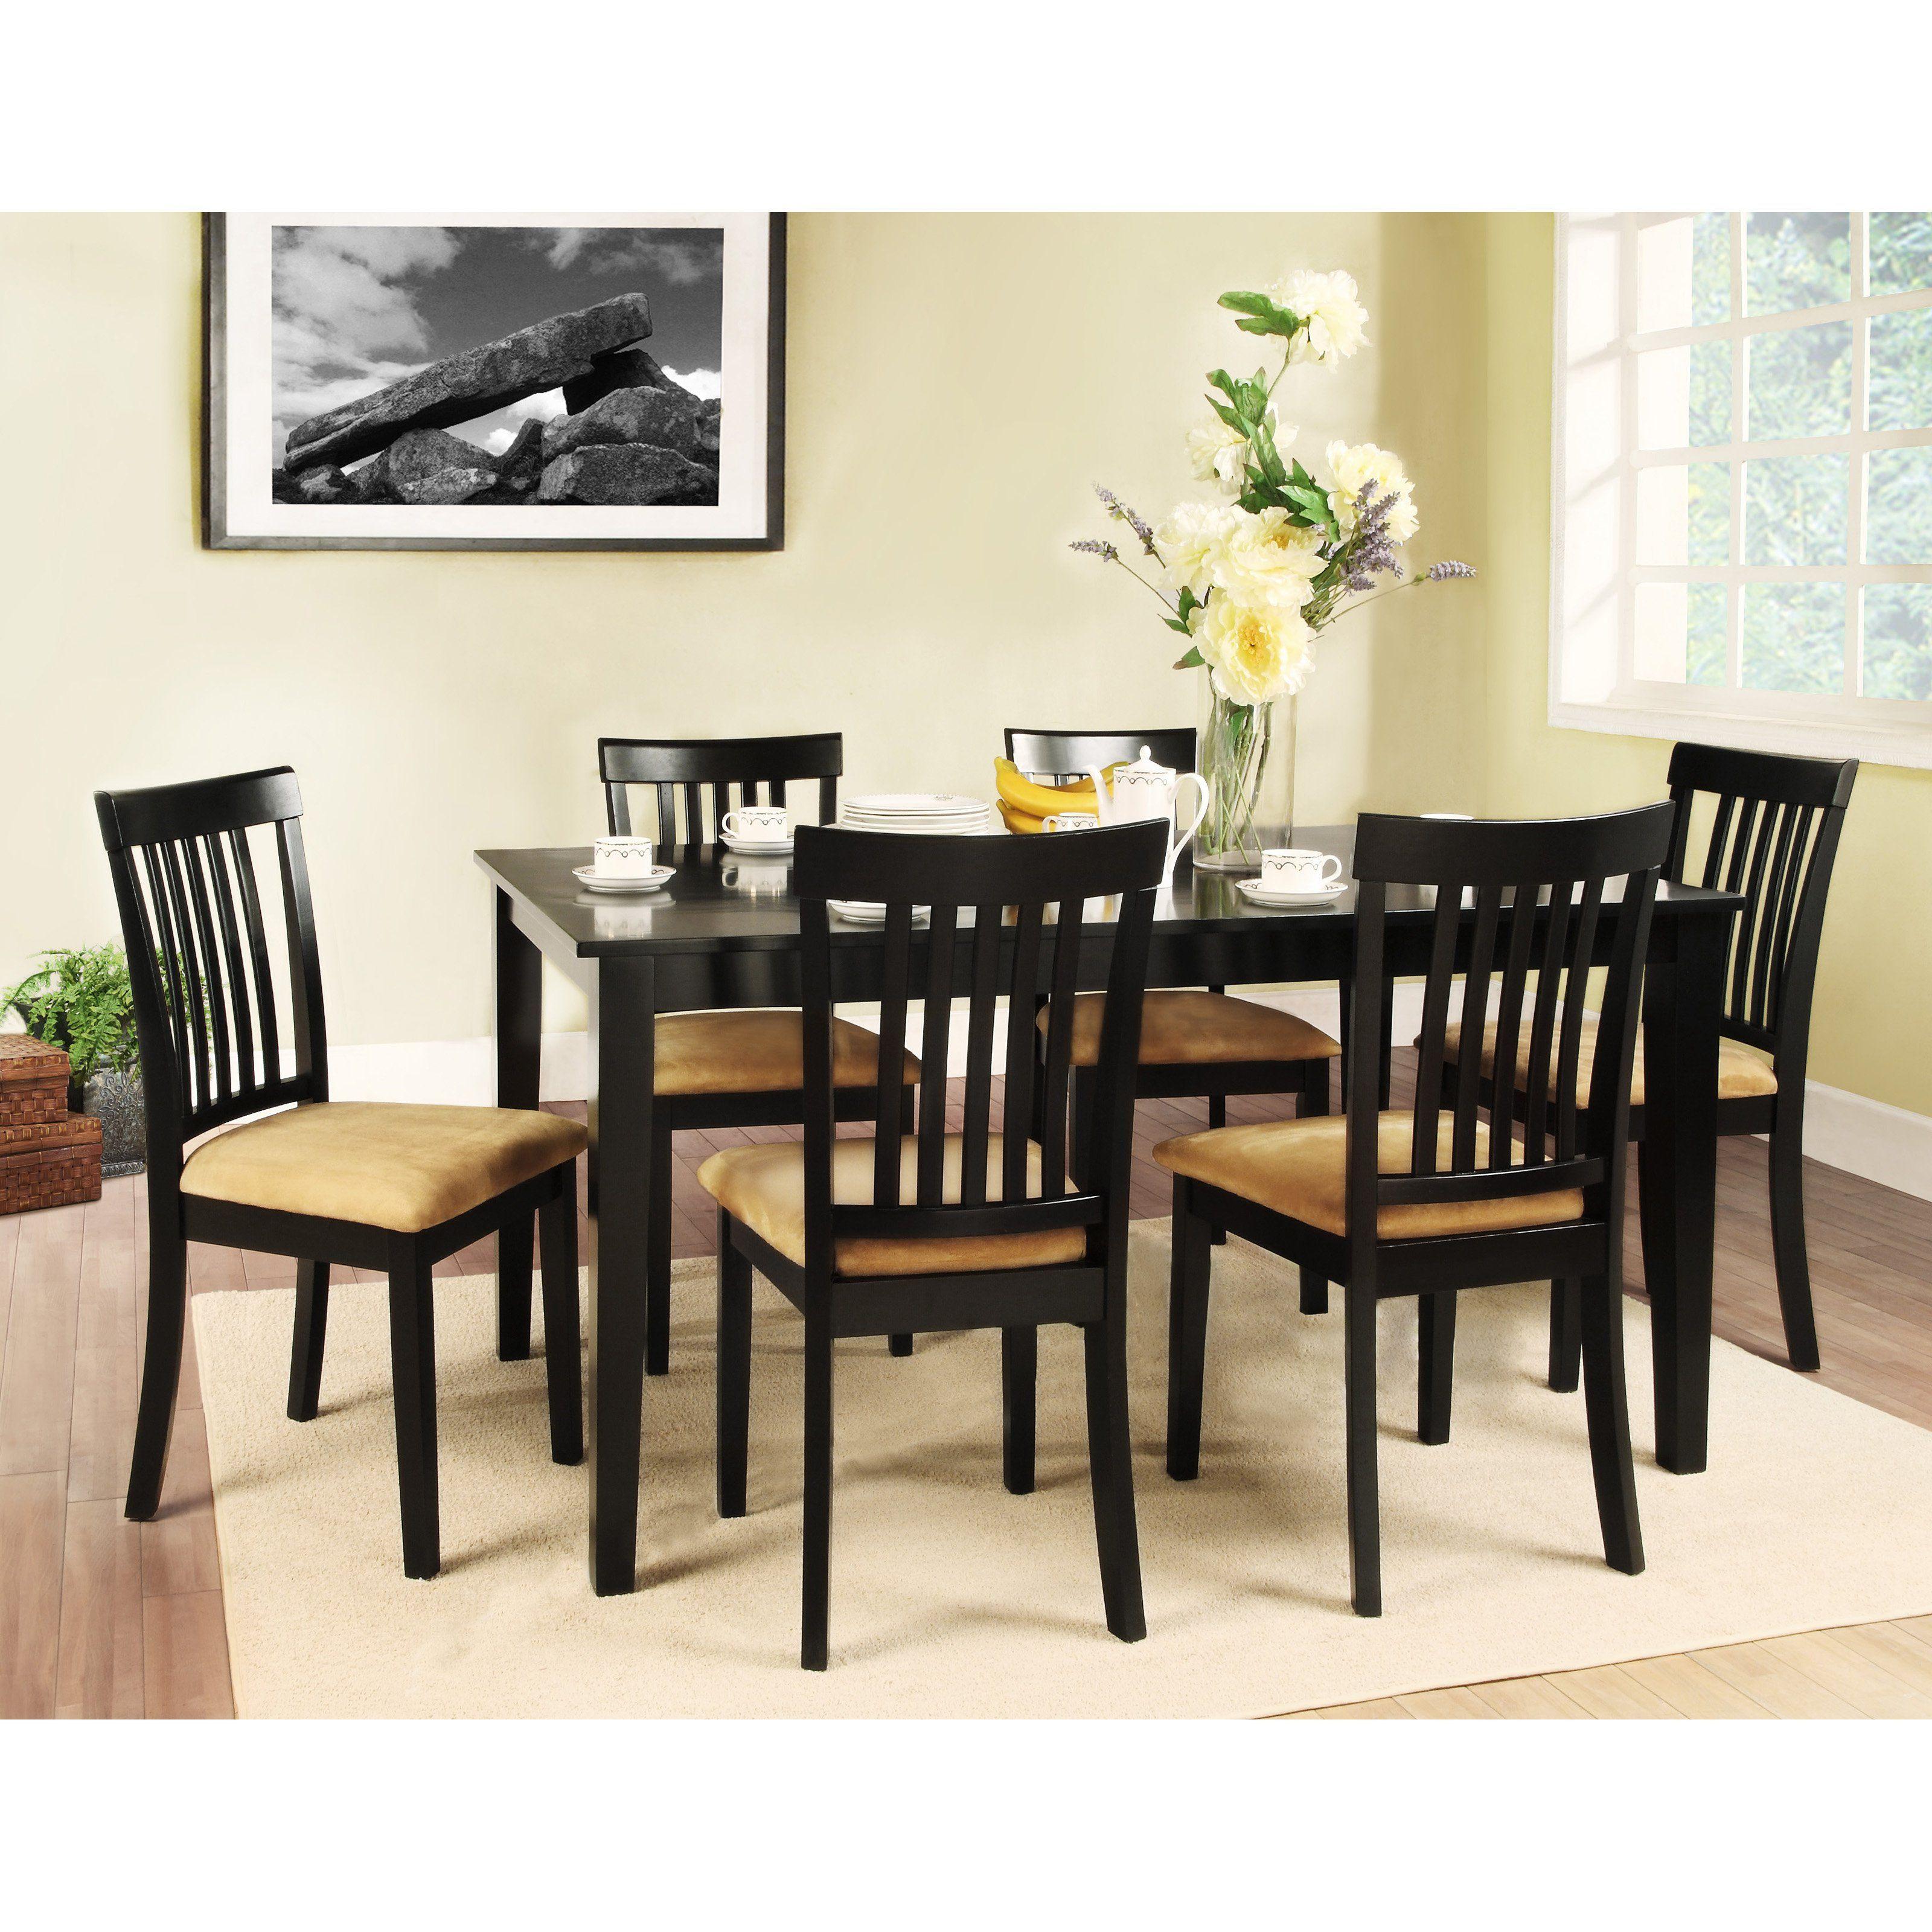 Weston Home Tibalt 7 Piece Rectangle Black Dining Table Set 60 In